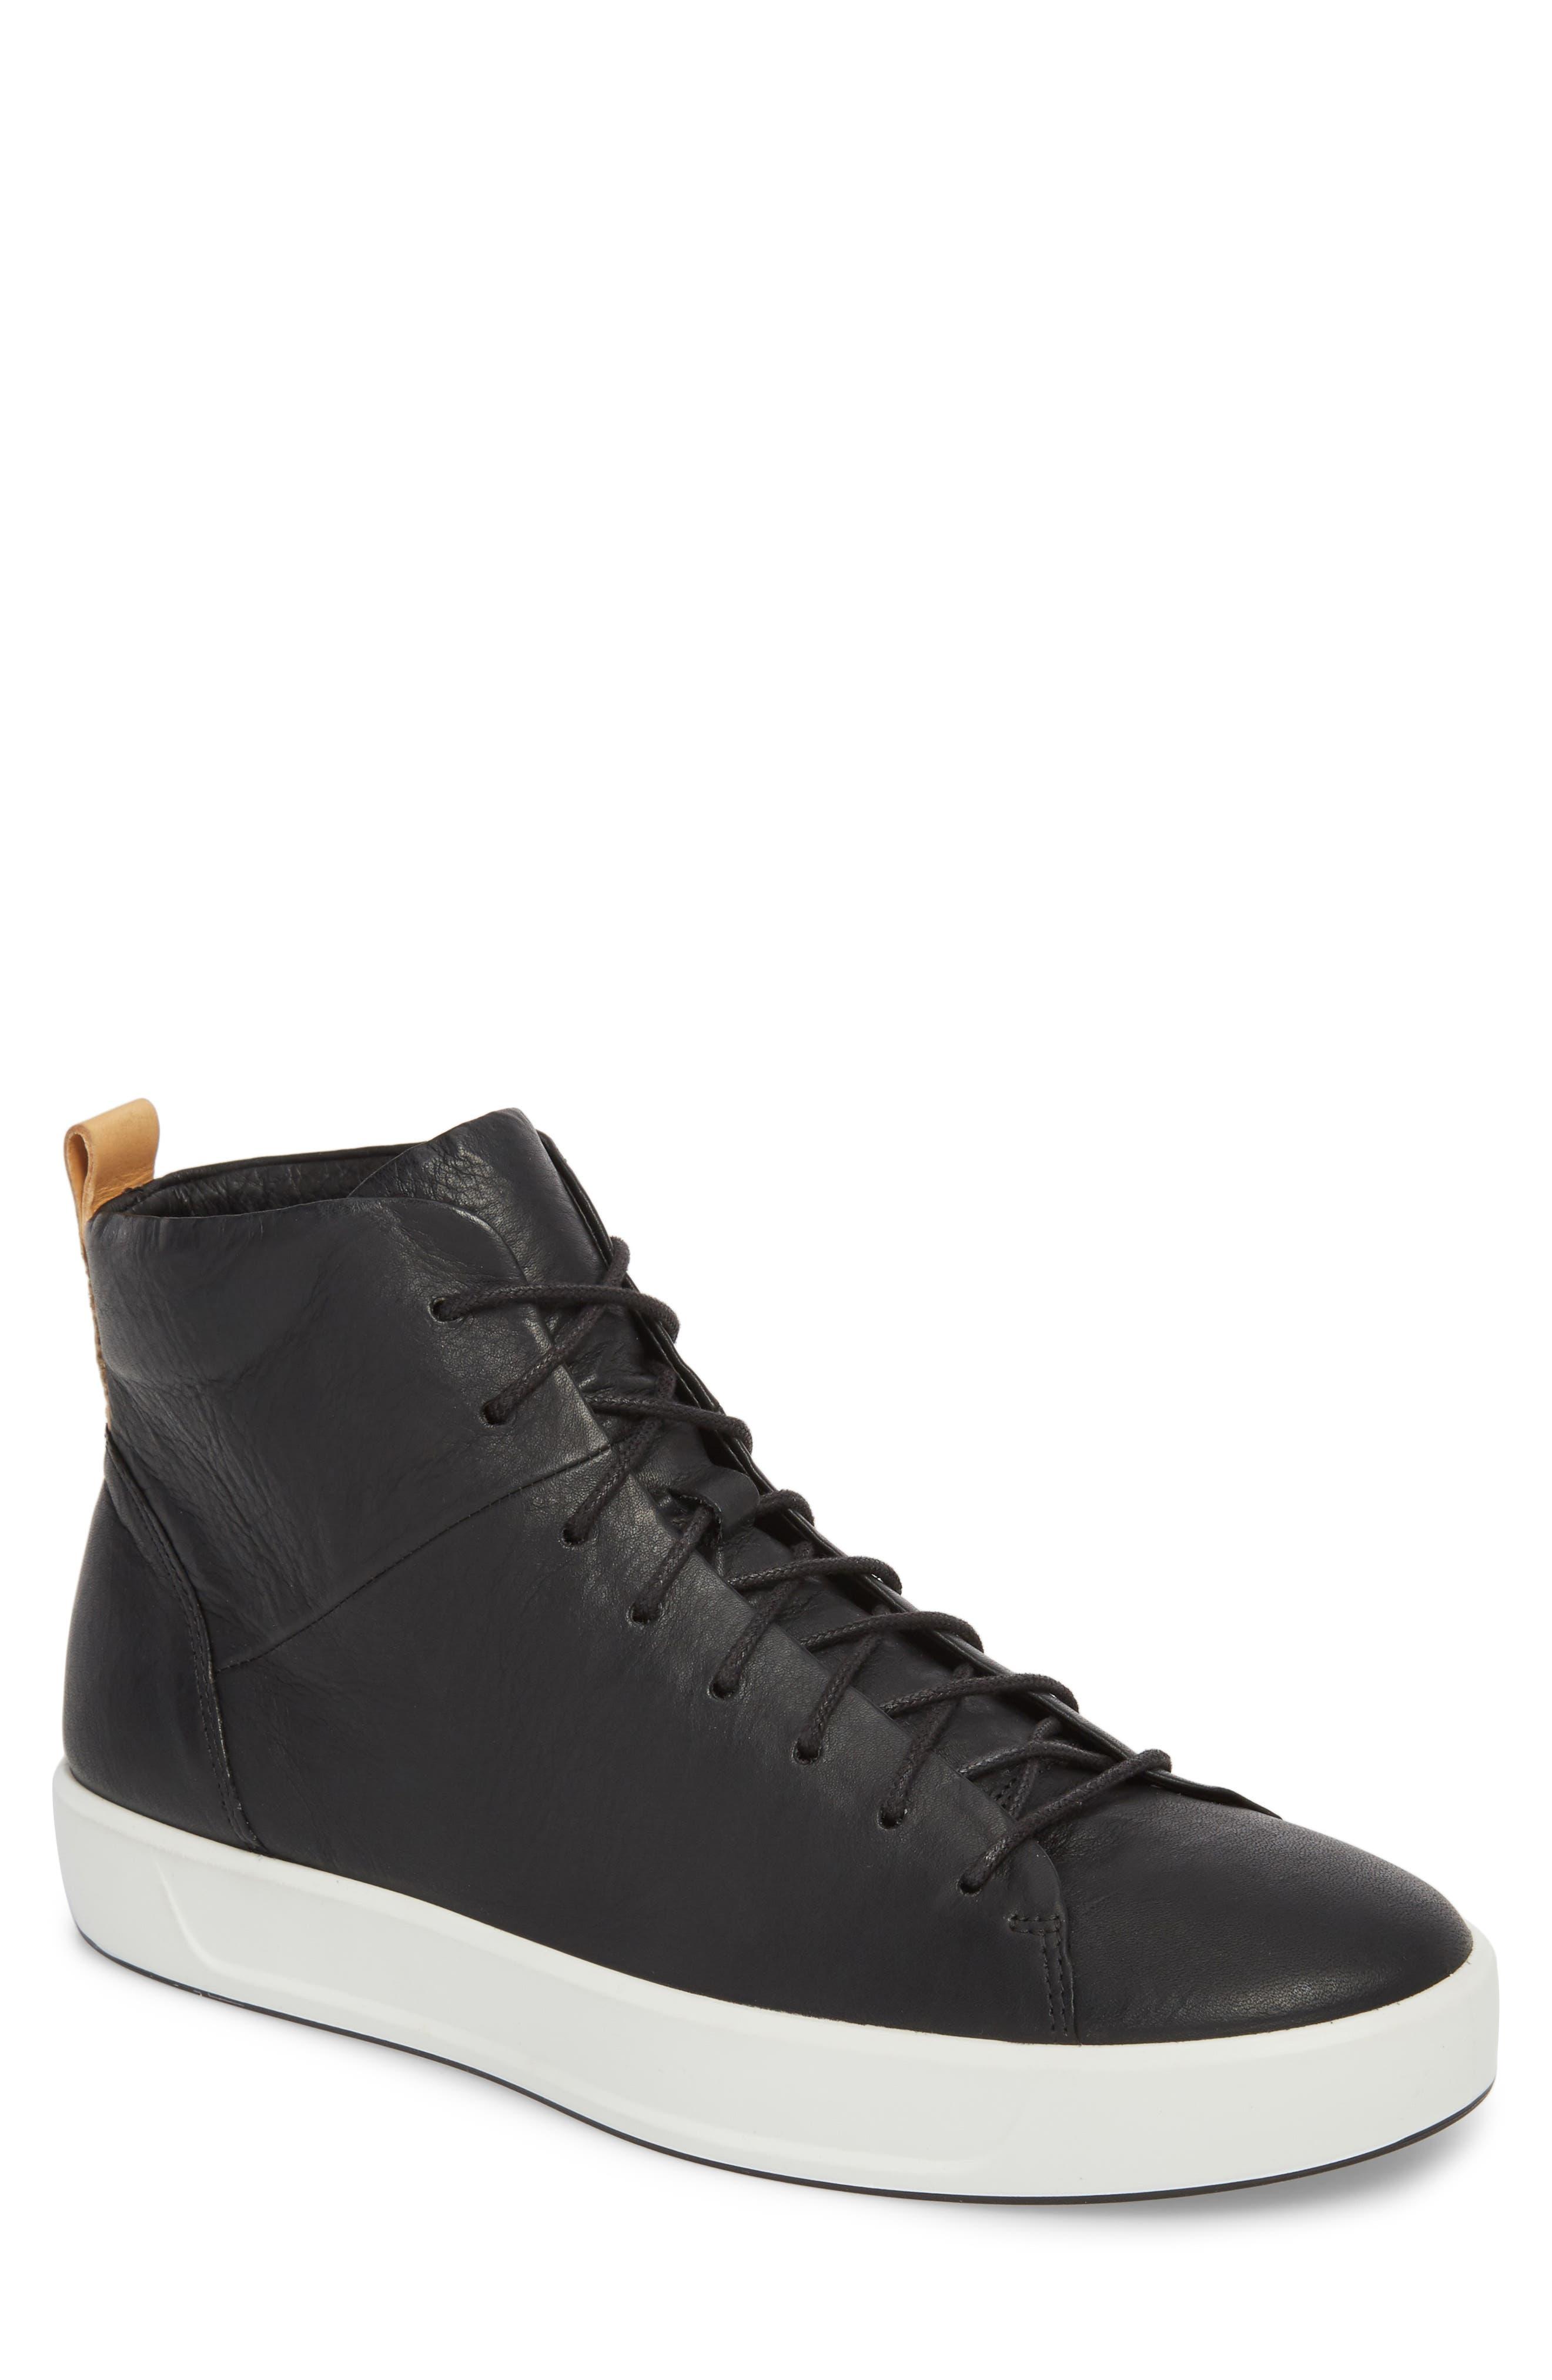 Soft 8 Sneaker,                             Main thumbnail 1, color,